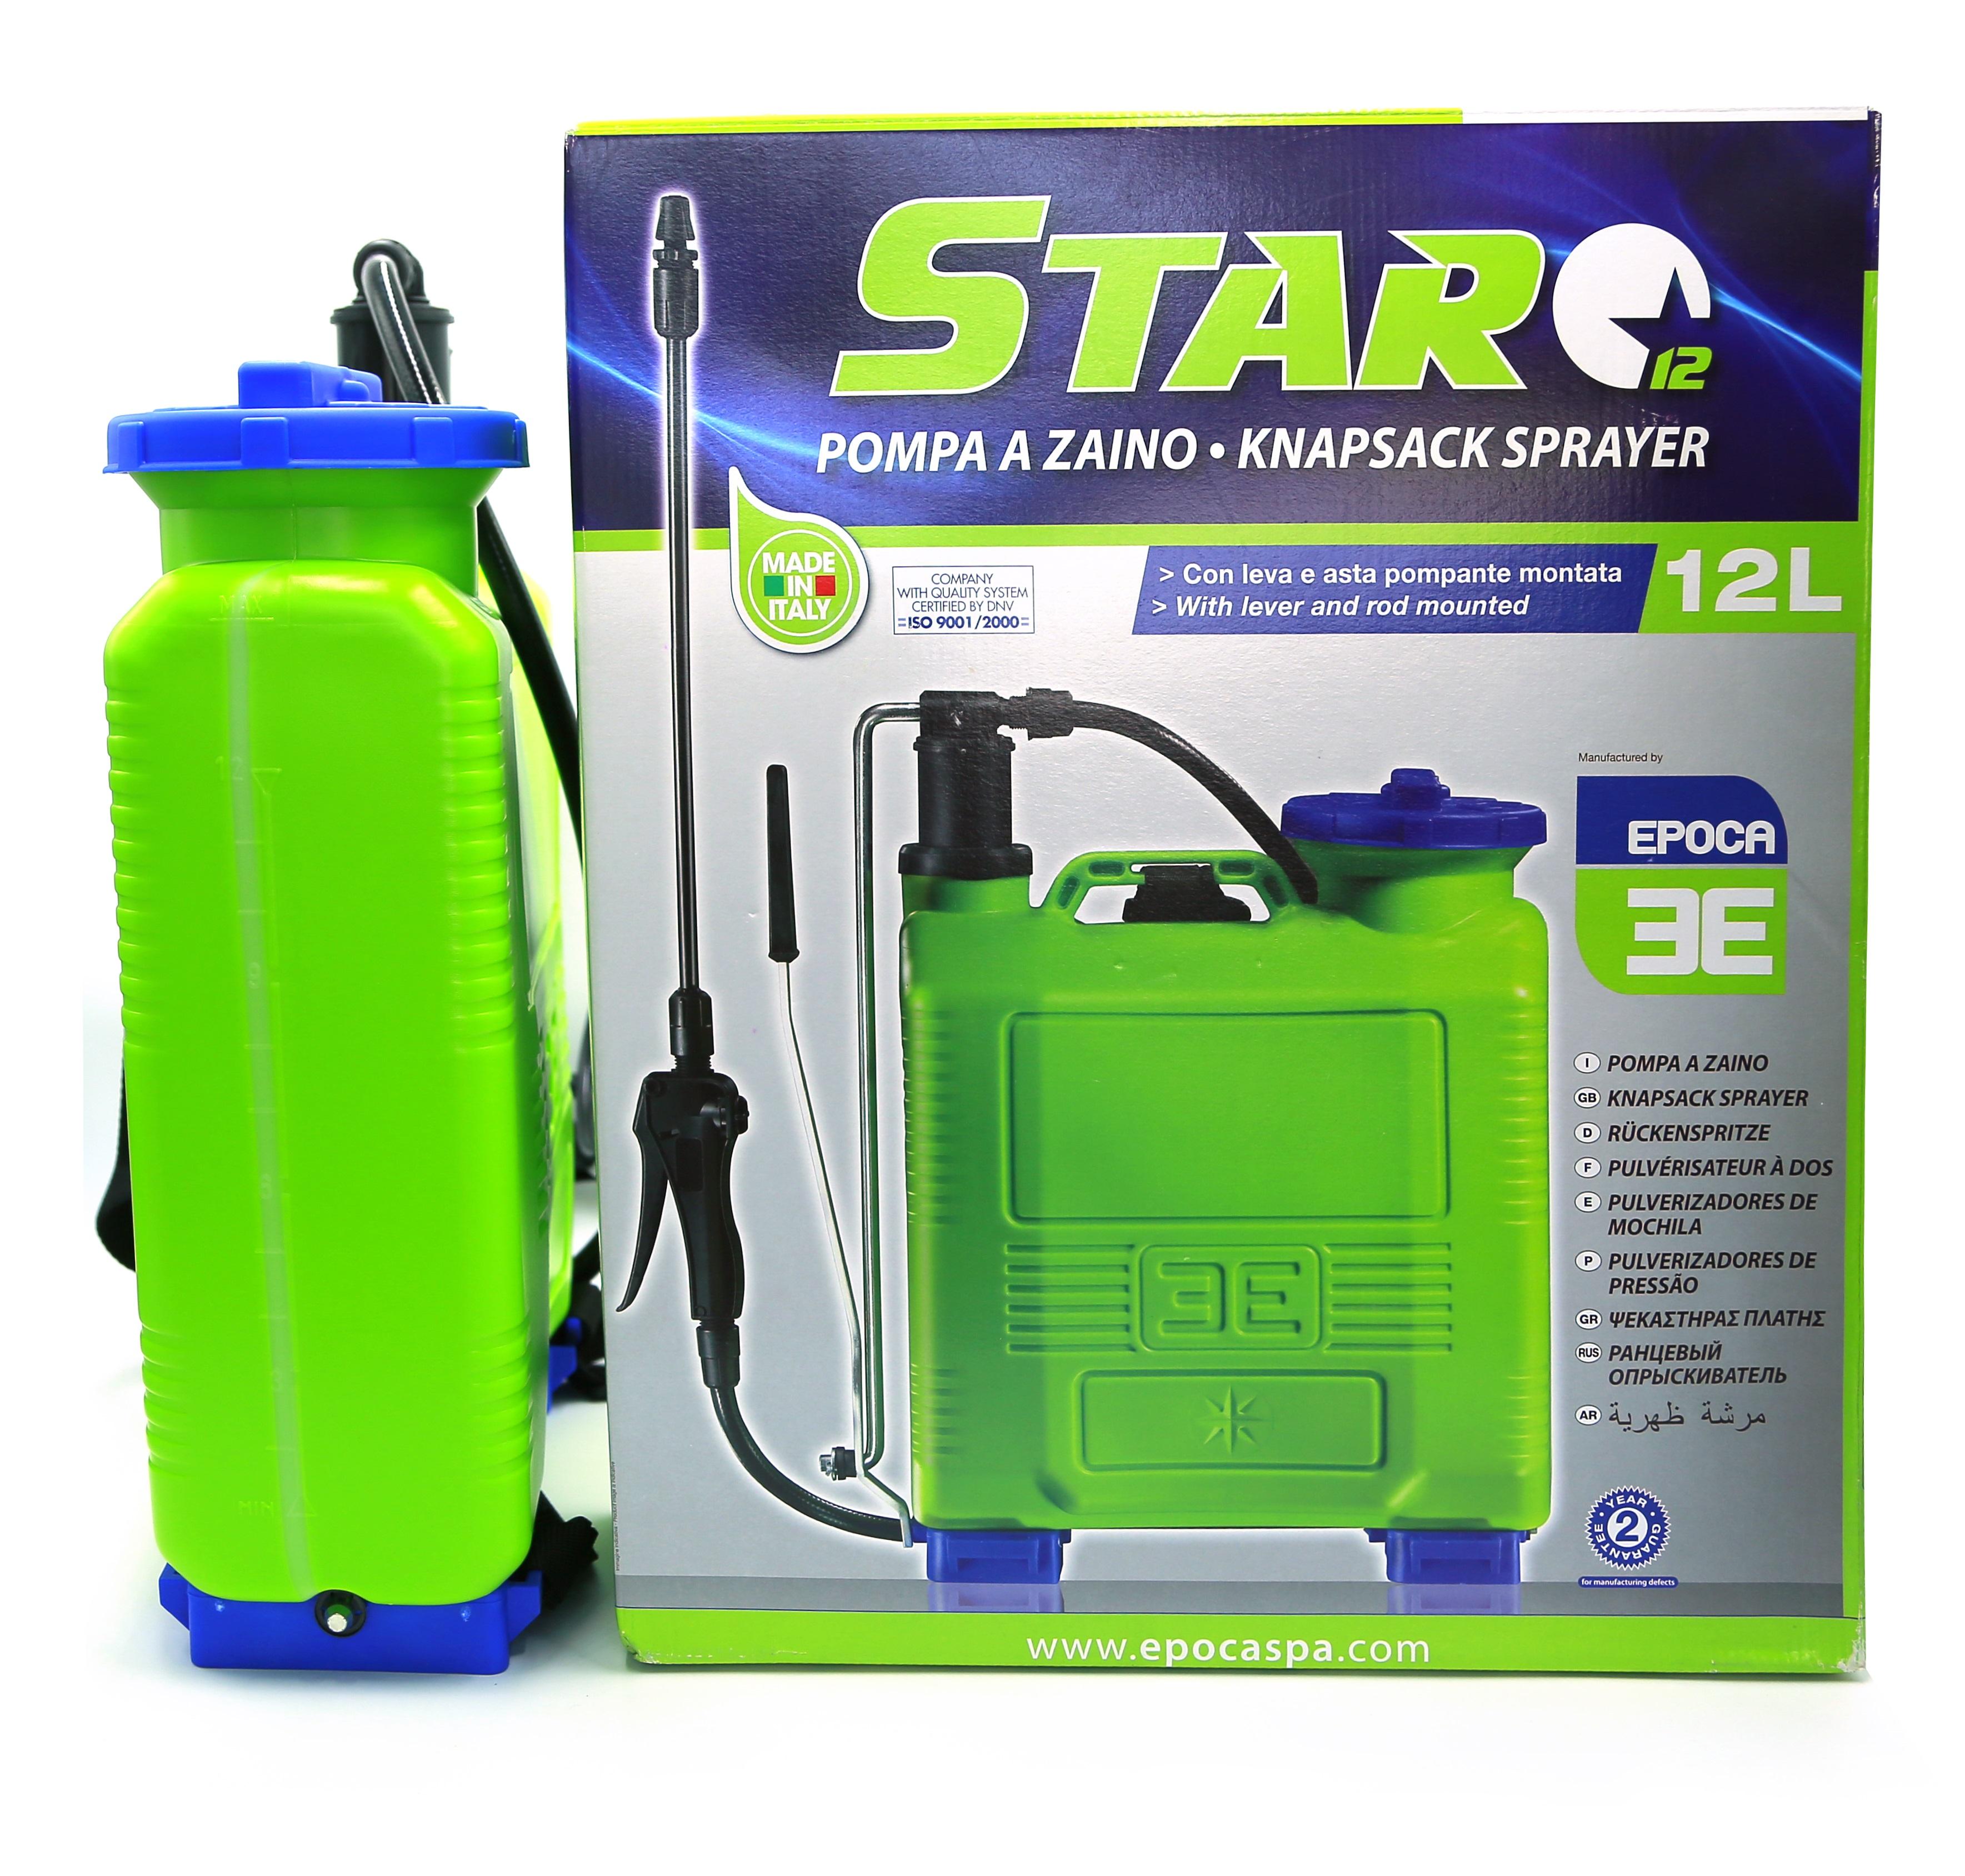 Italy Knapsack sprayers Star 12 Ltr (Epoca)